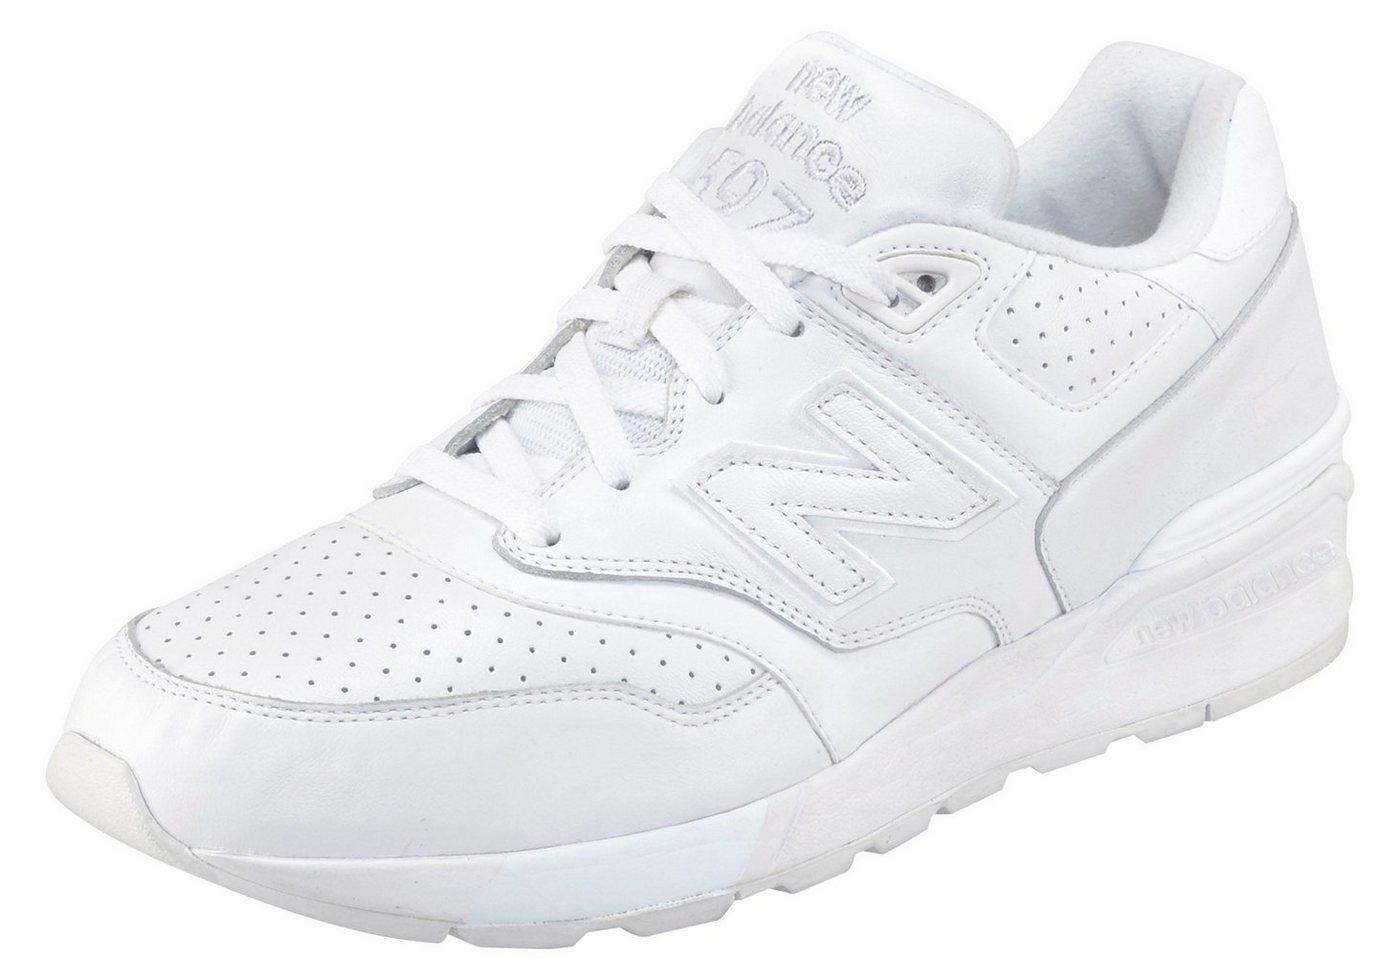 New Balance »ML597 Leather« Sneaker Sale Angebote Gastrose-Kerkwitz